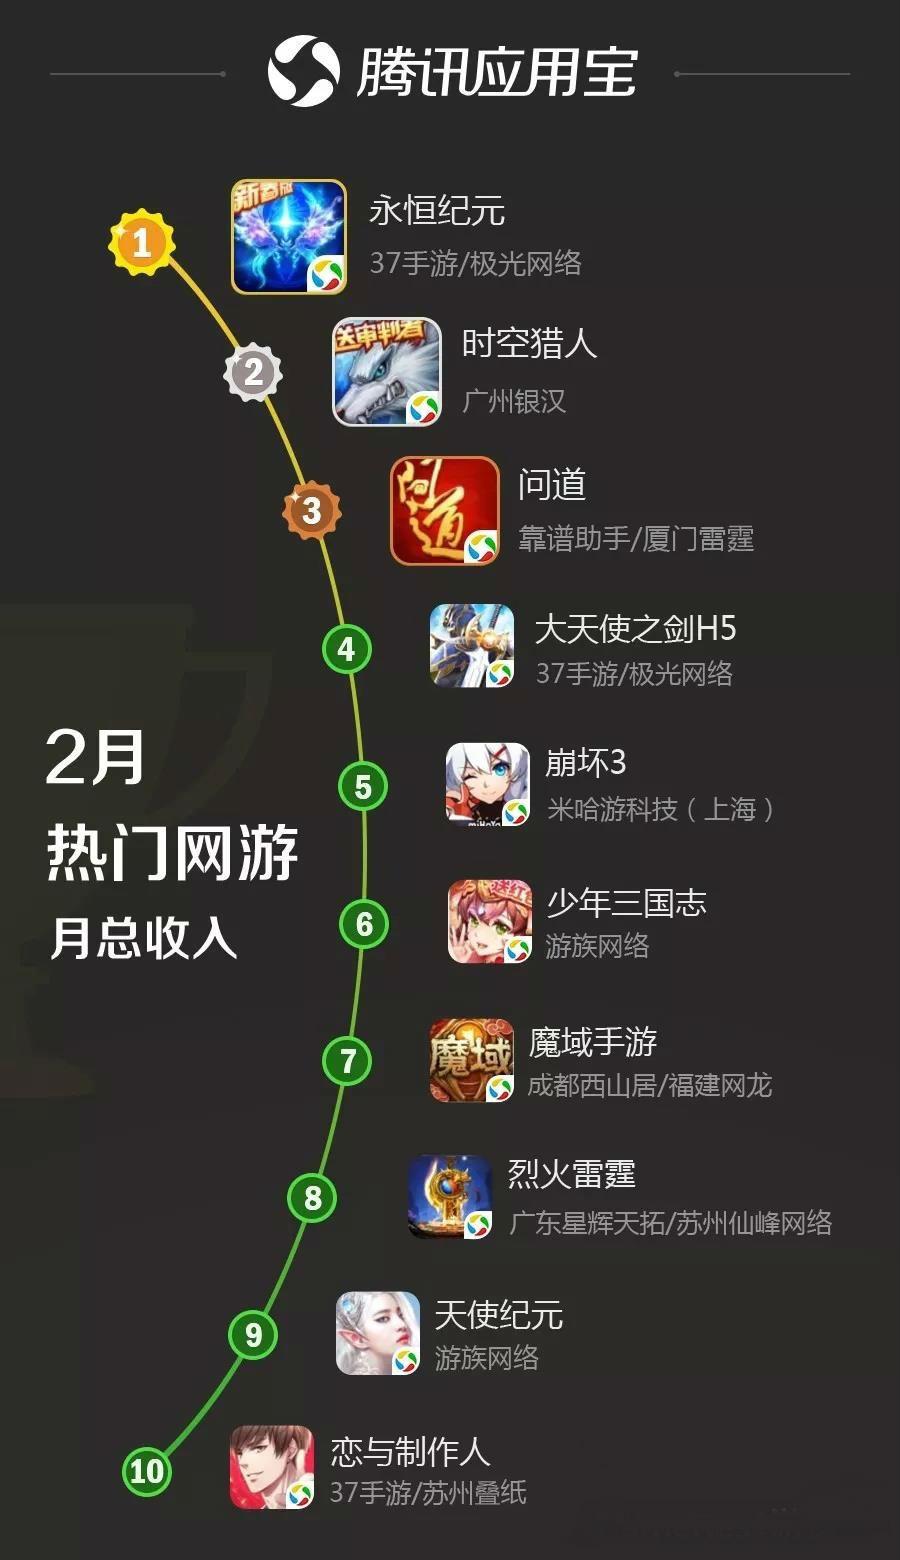 RPG 类新游强势霸榜